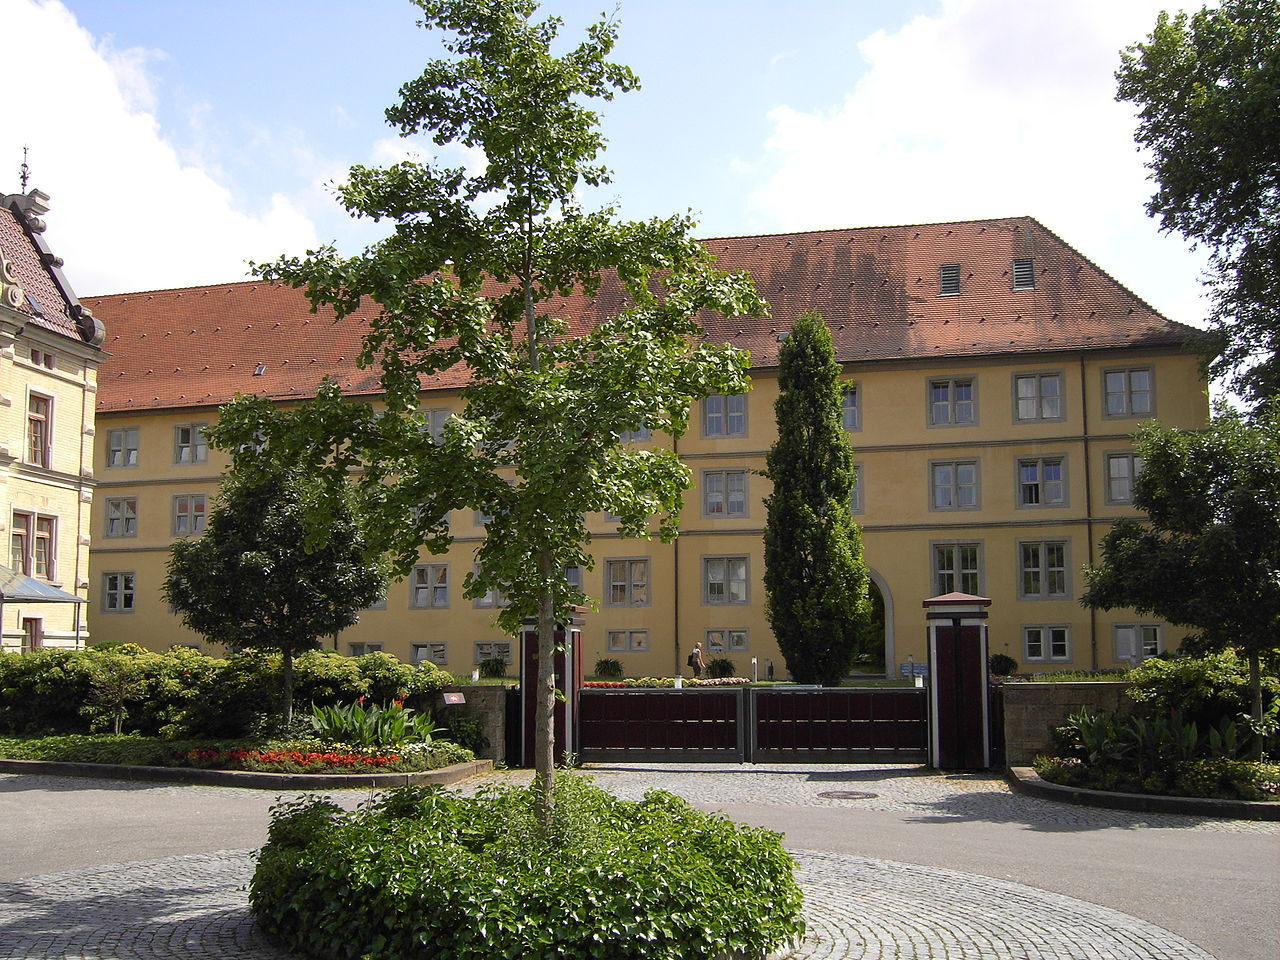 Bild Schloss Winnental Winnenden